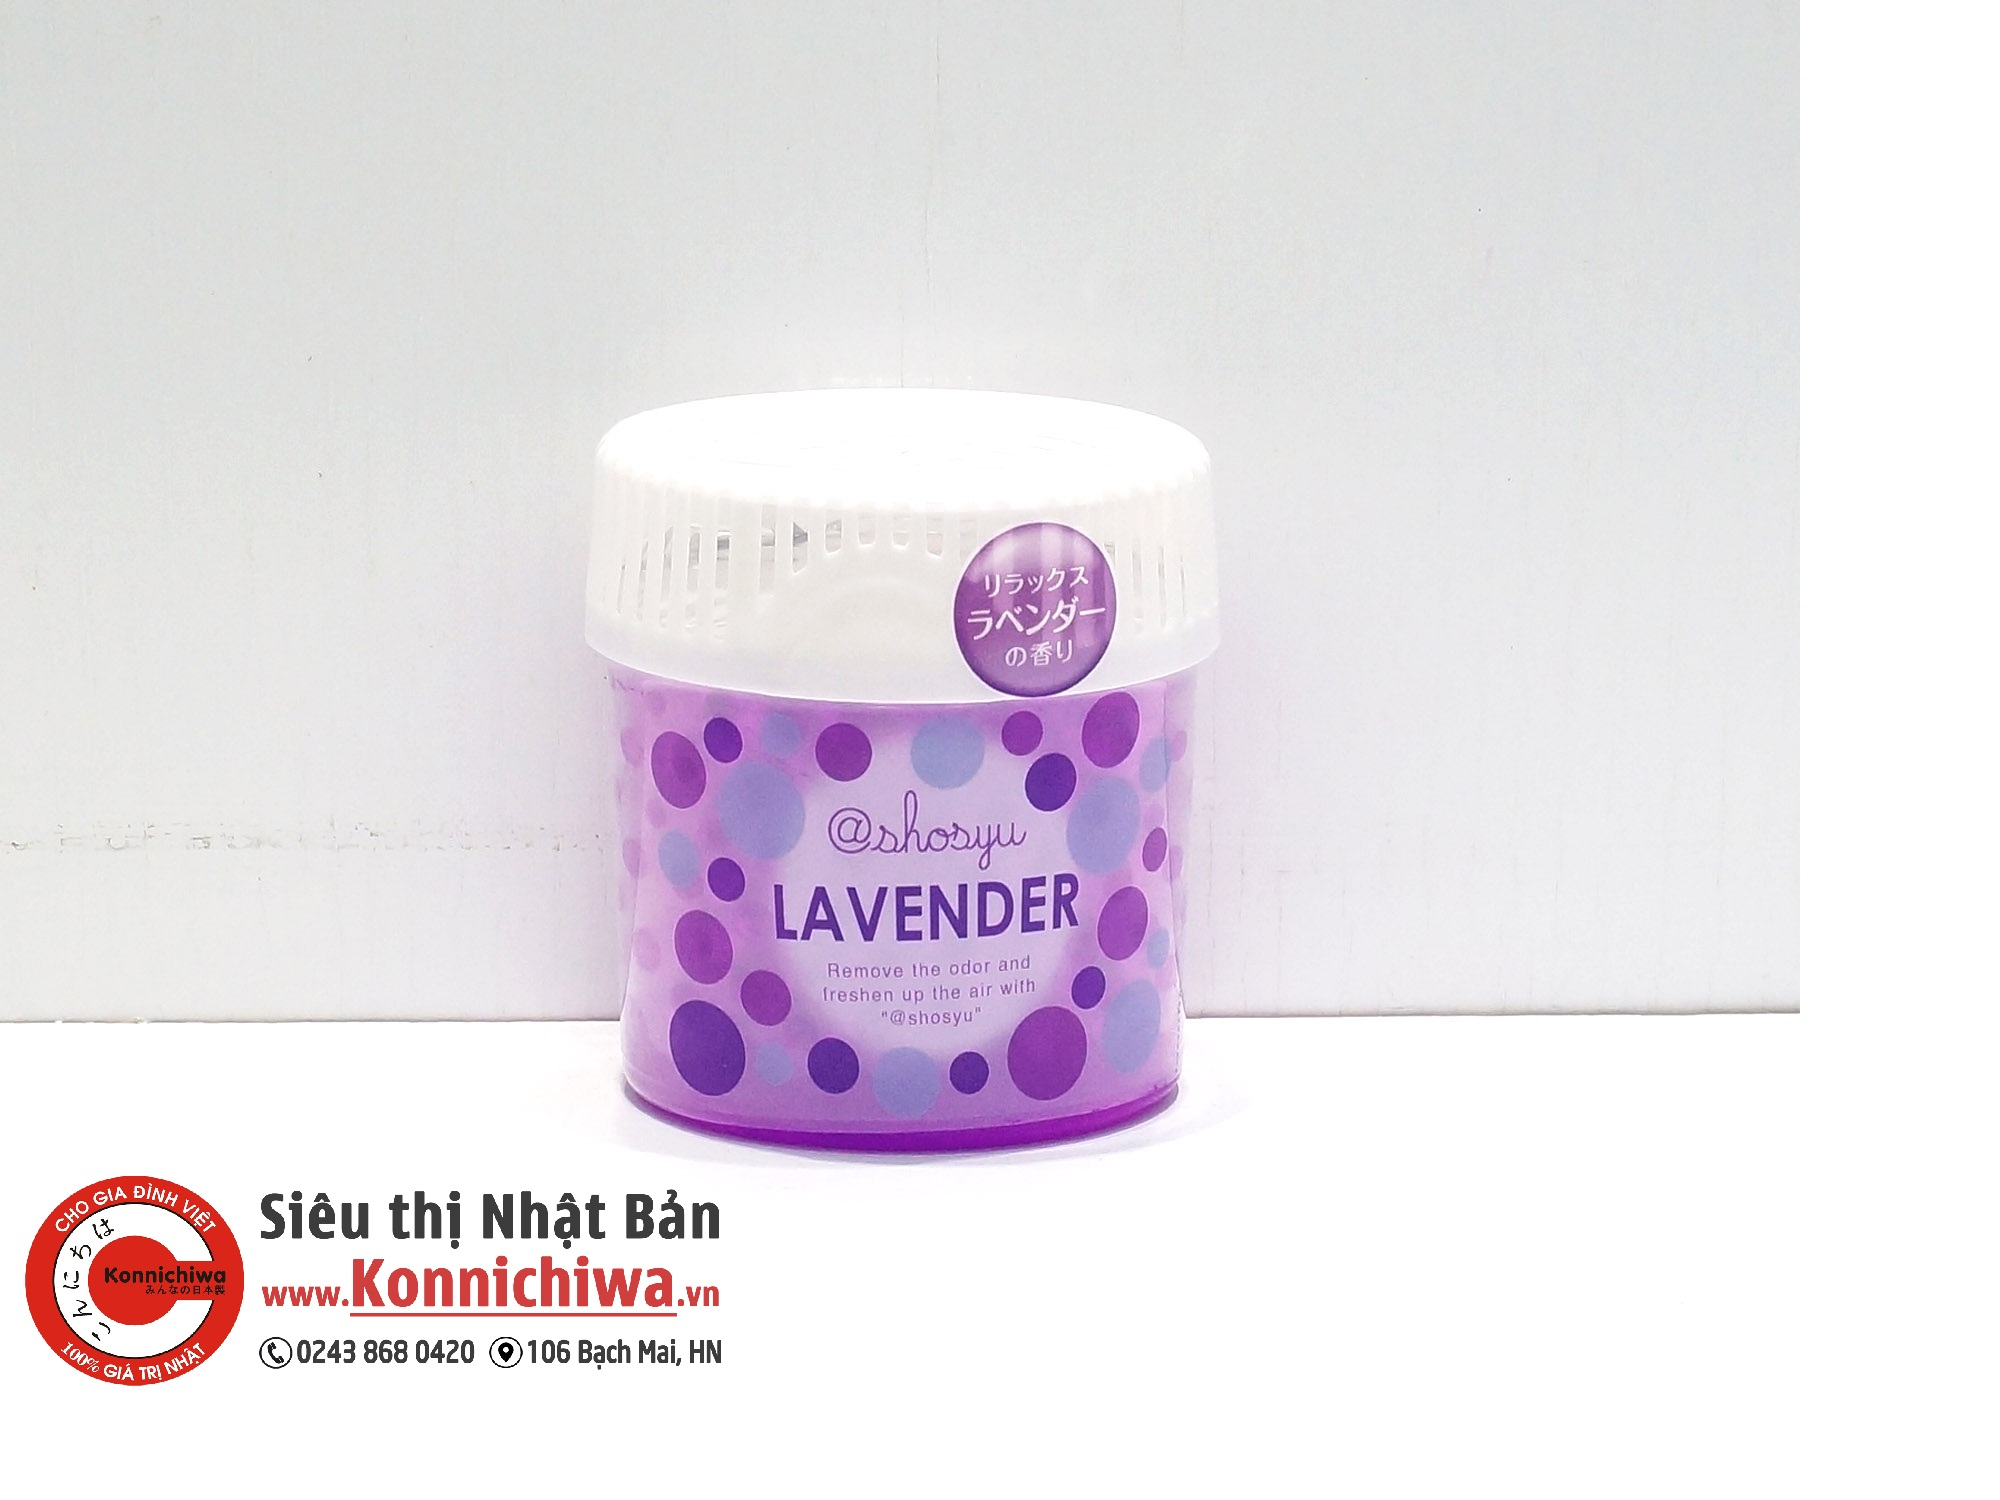 hop-thach-khu-mui-kokubo-150g-lavender